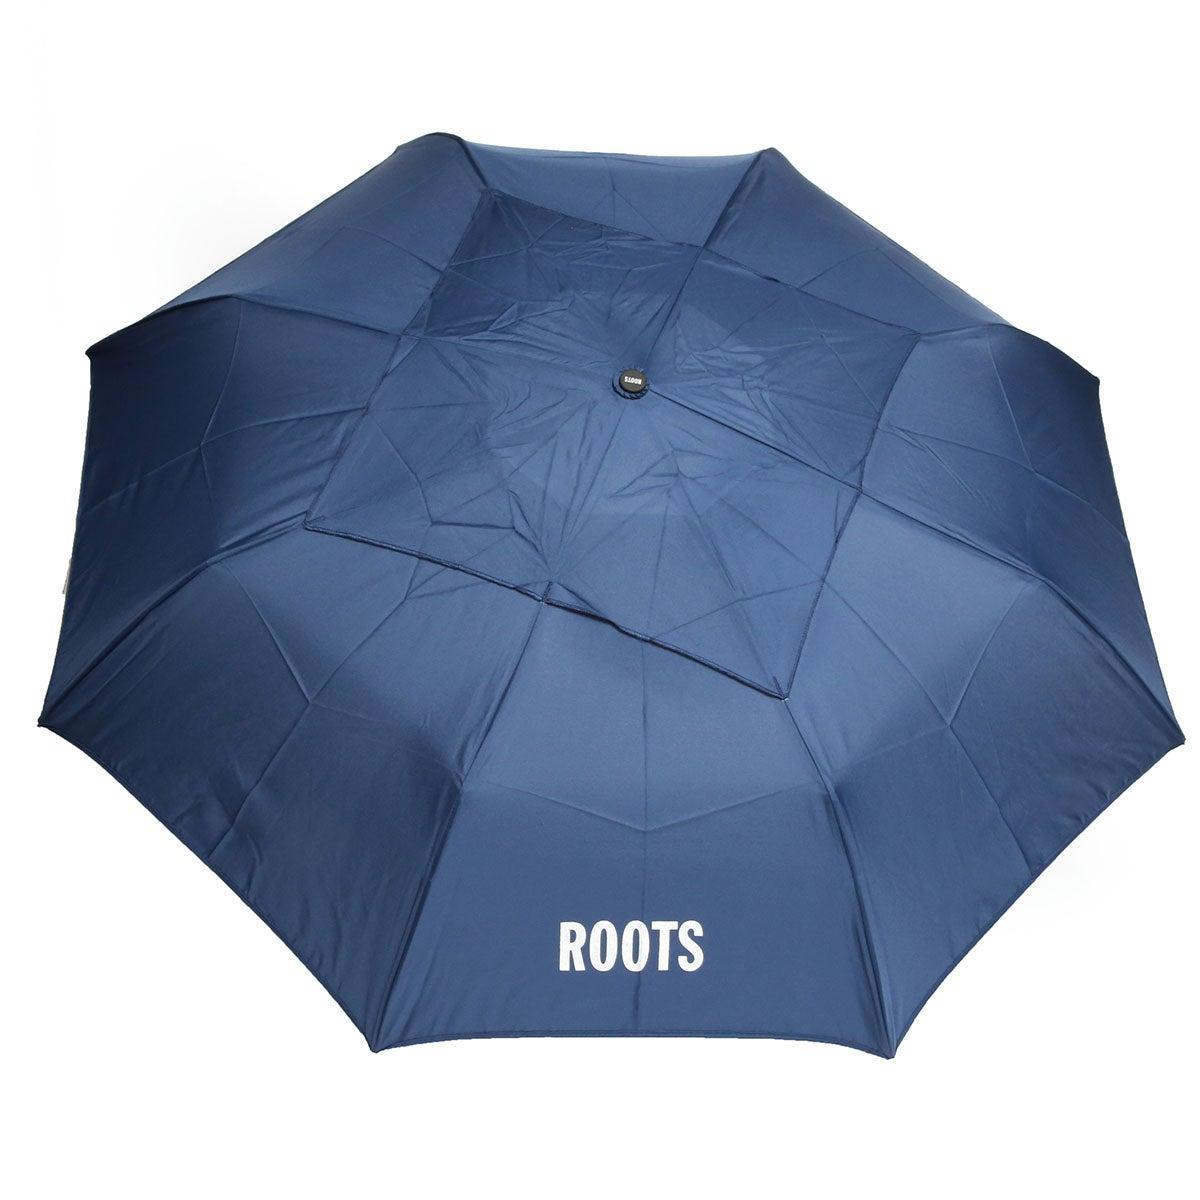 Roots73 navy telescopic vented umbrella